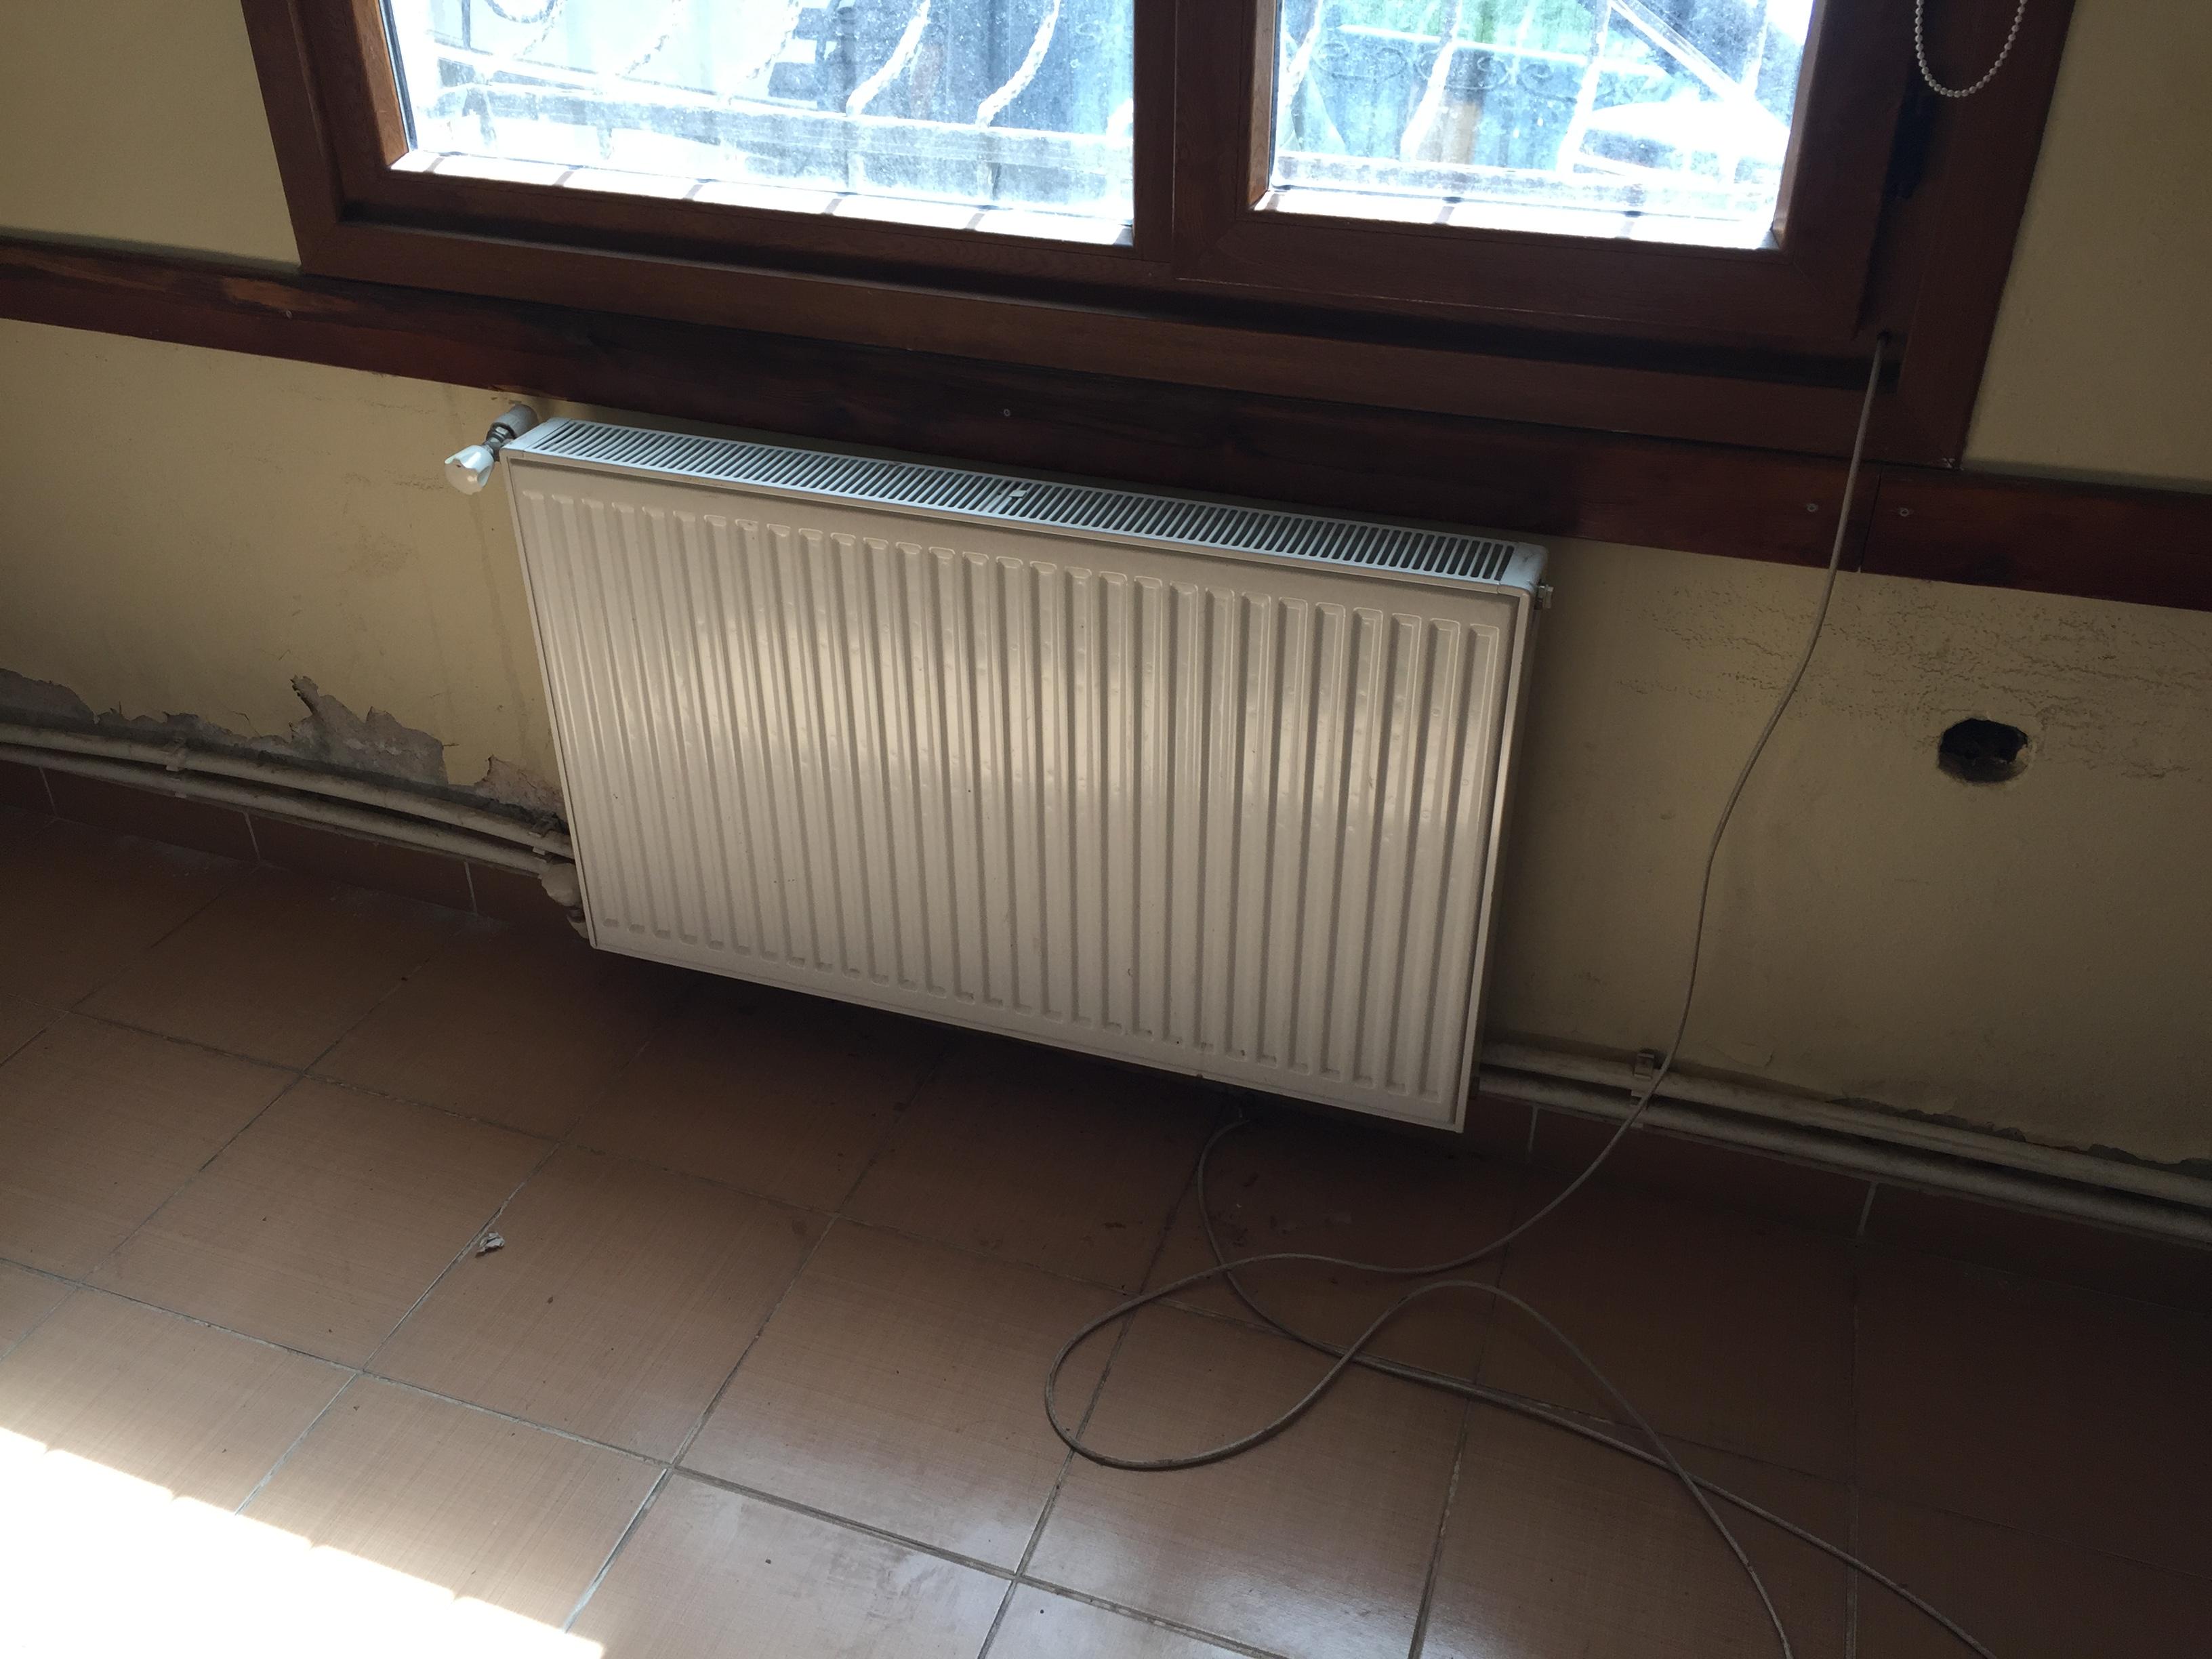 panel radyatör_45830 - ryuklemobi